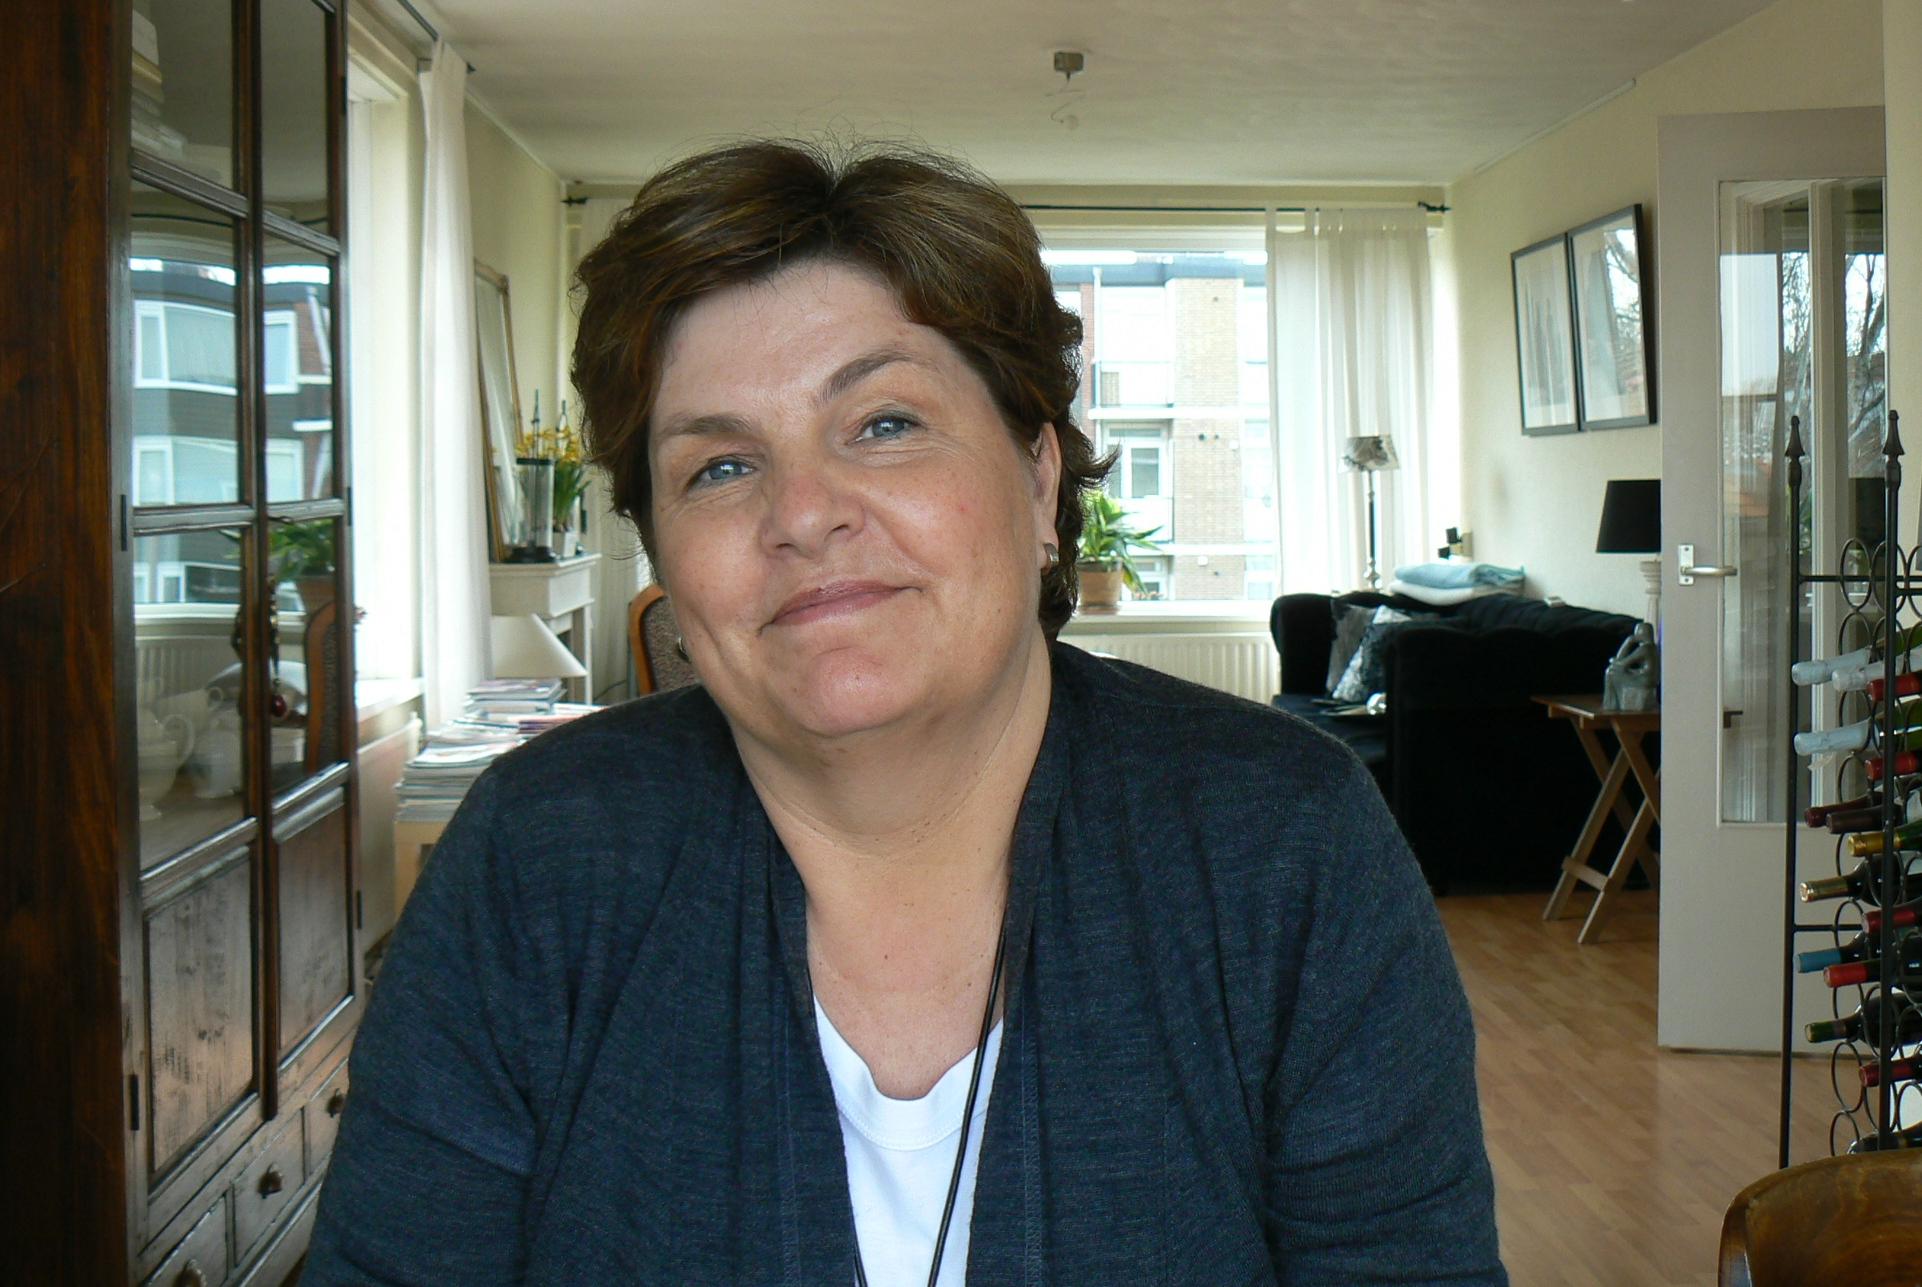 Jacqueline Vergnes